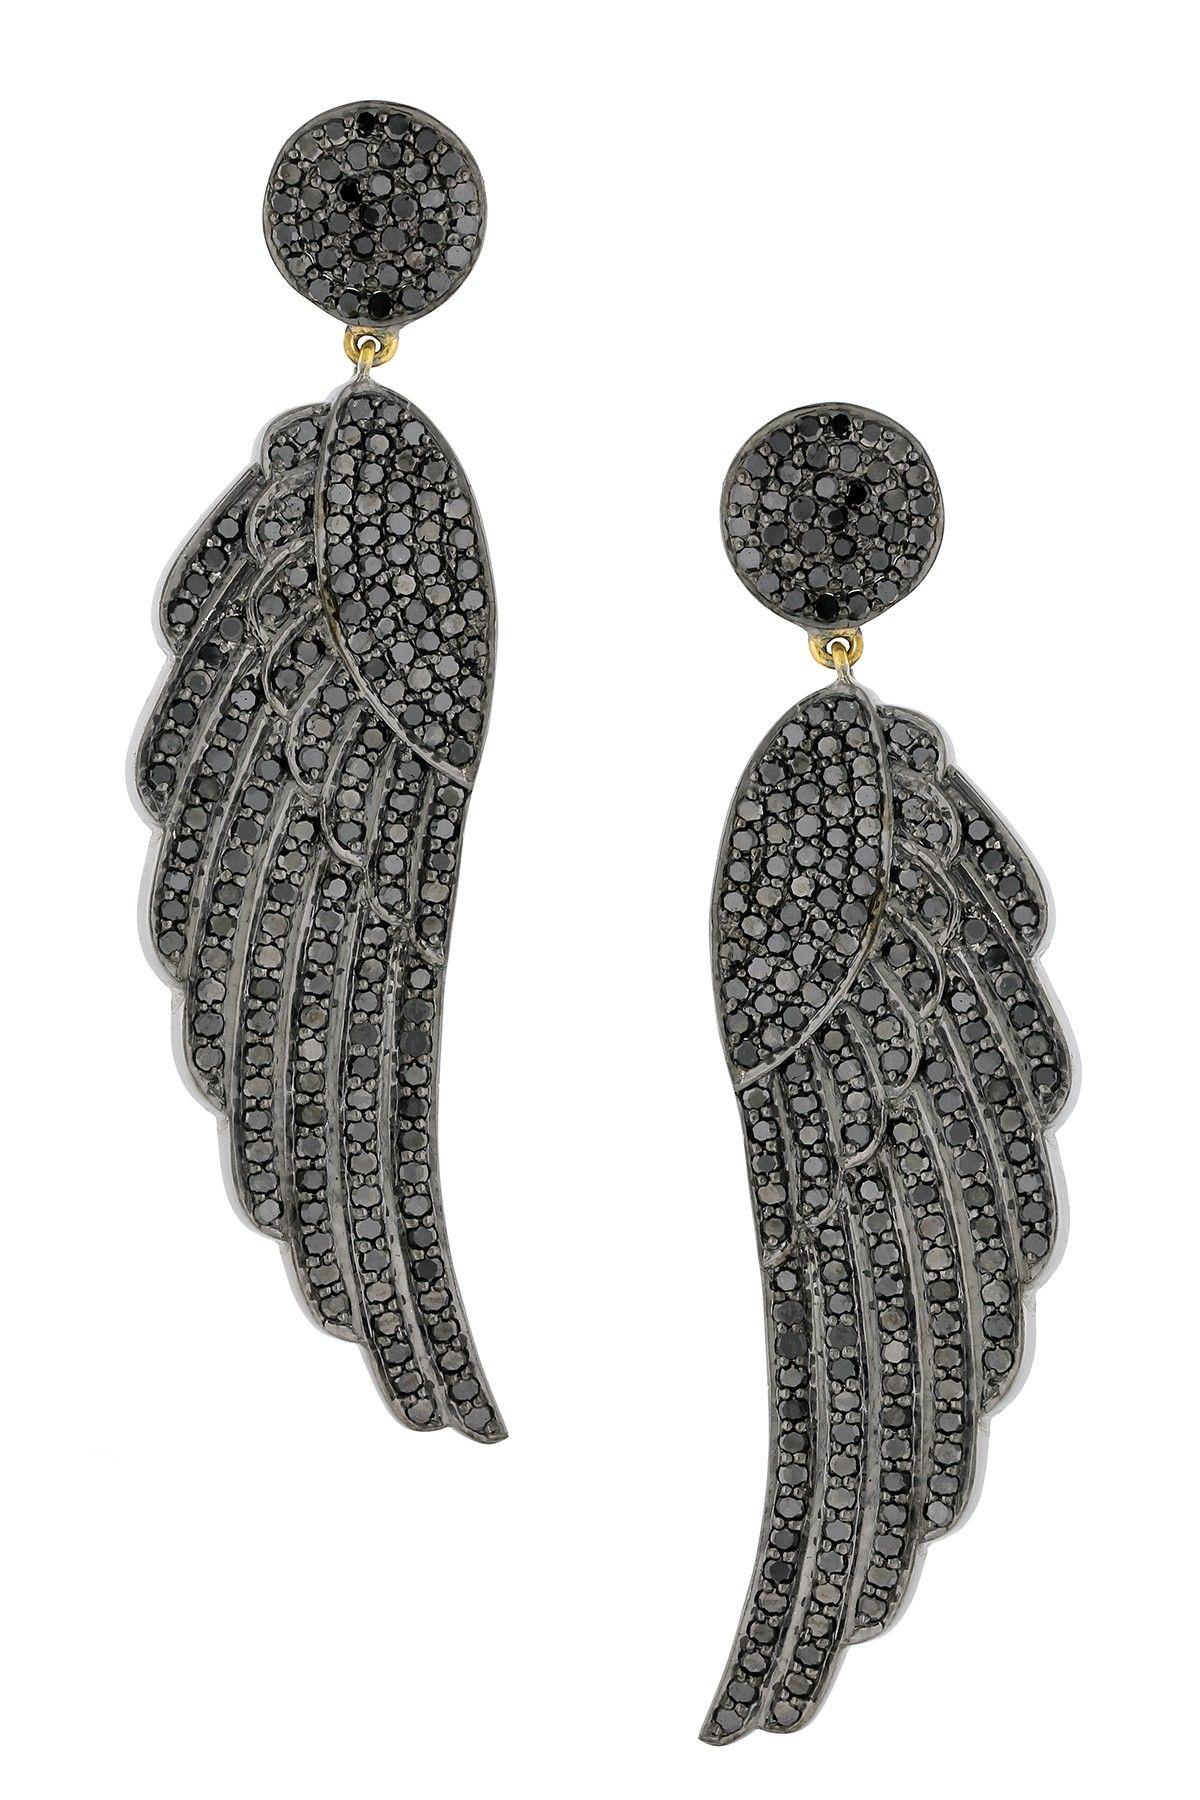 Pave Diamond Wing Drop Earrings - 5.81 ctw